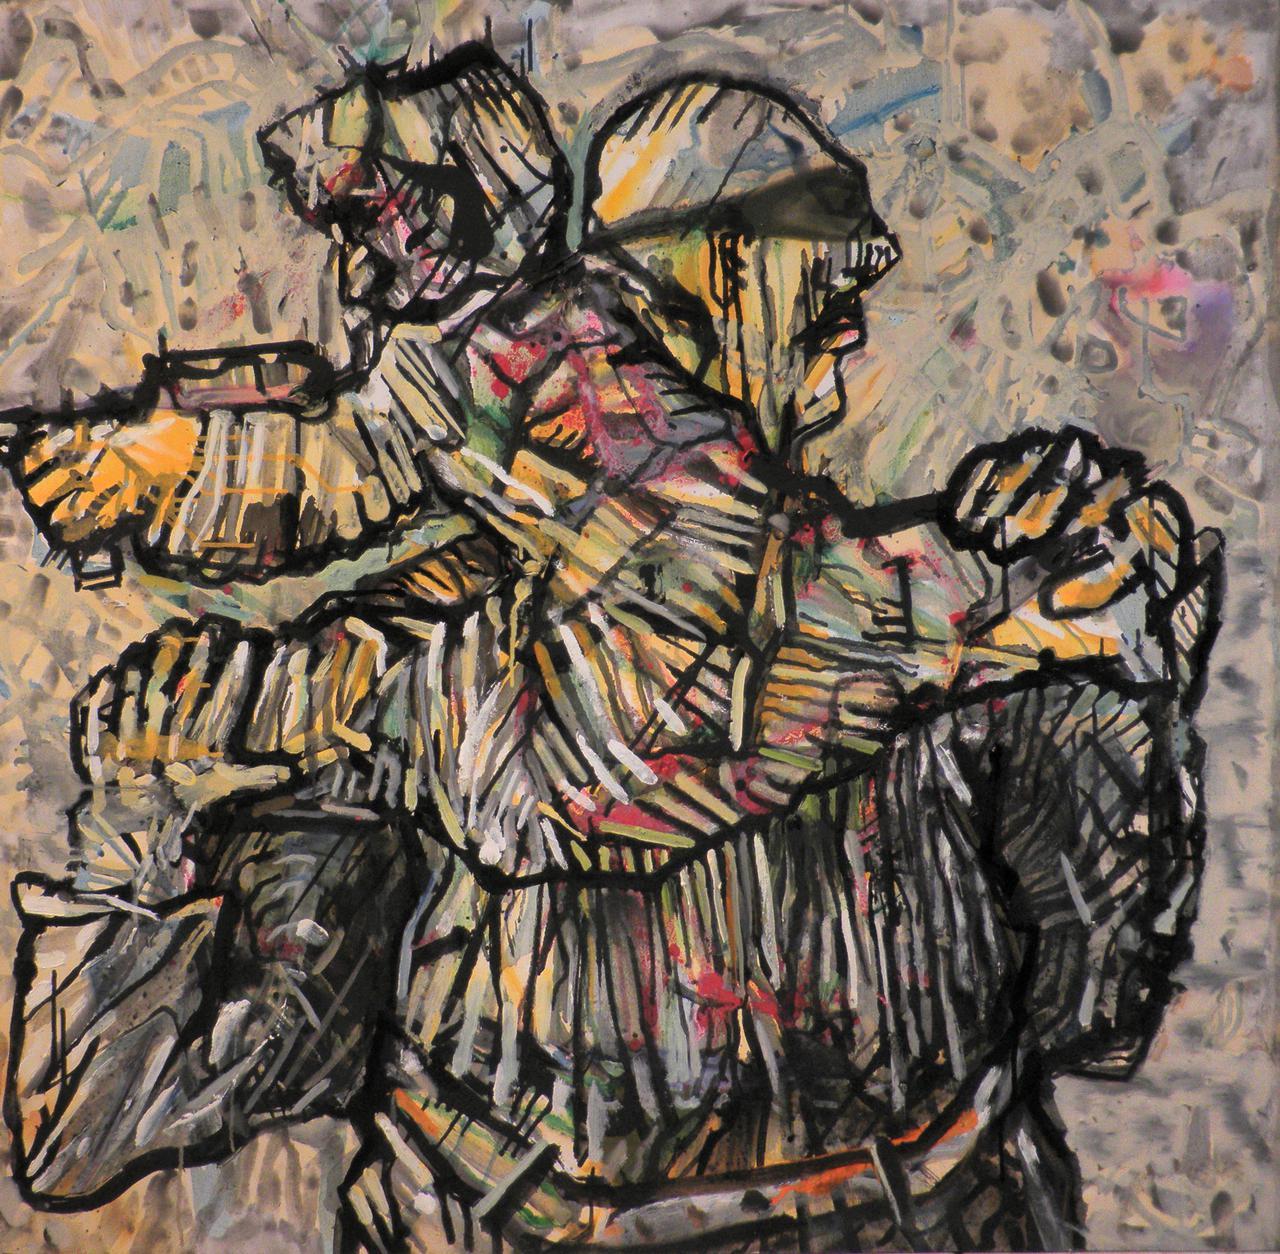 alt=Haralabos Katsatsidis, Man and child in war zone, 1 m x 1 m, oil on canvas, 2018